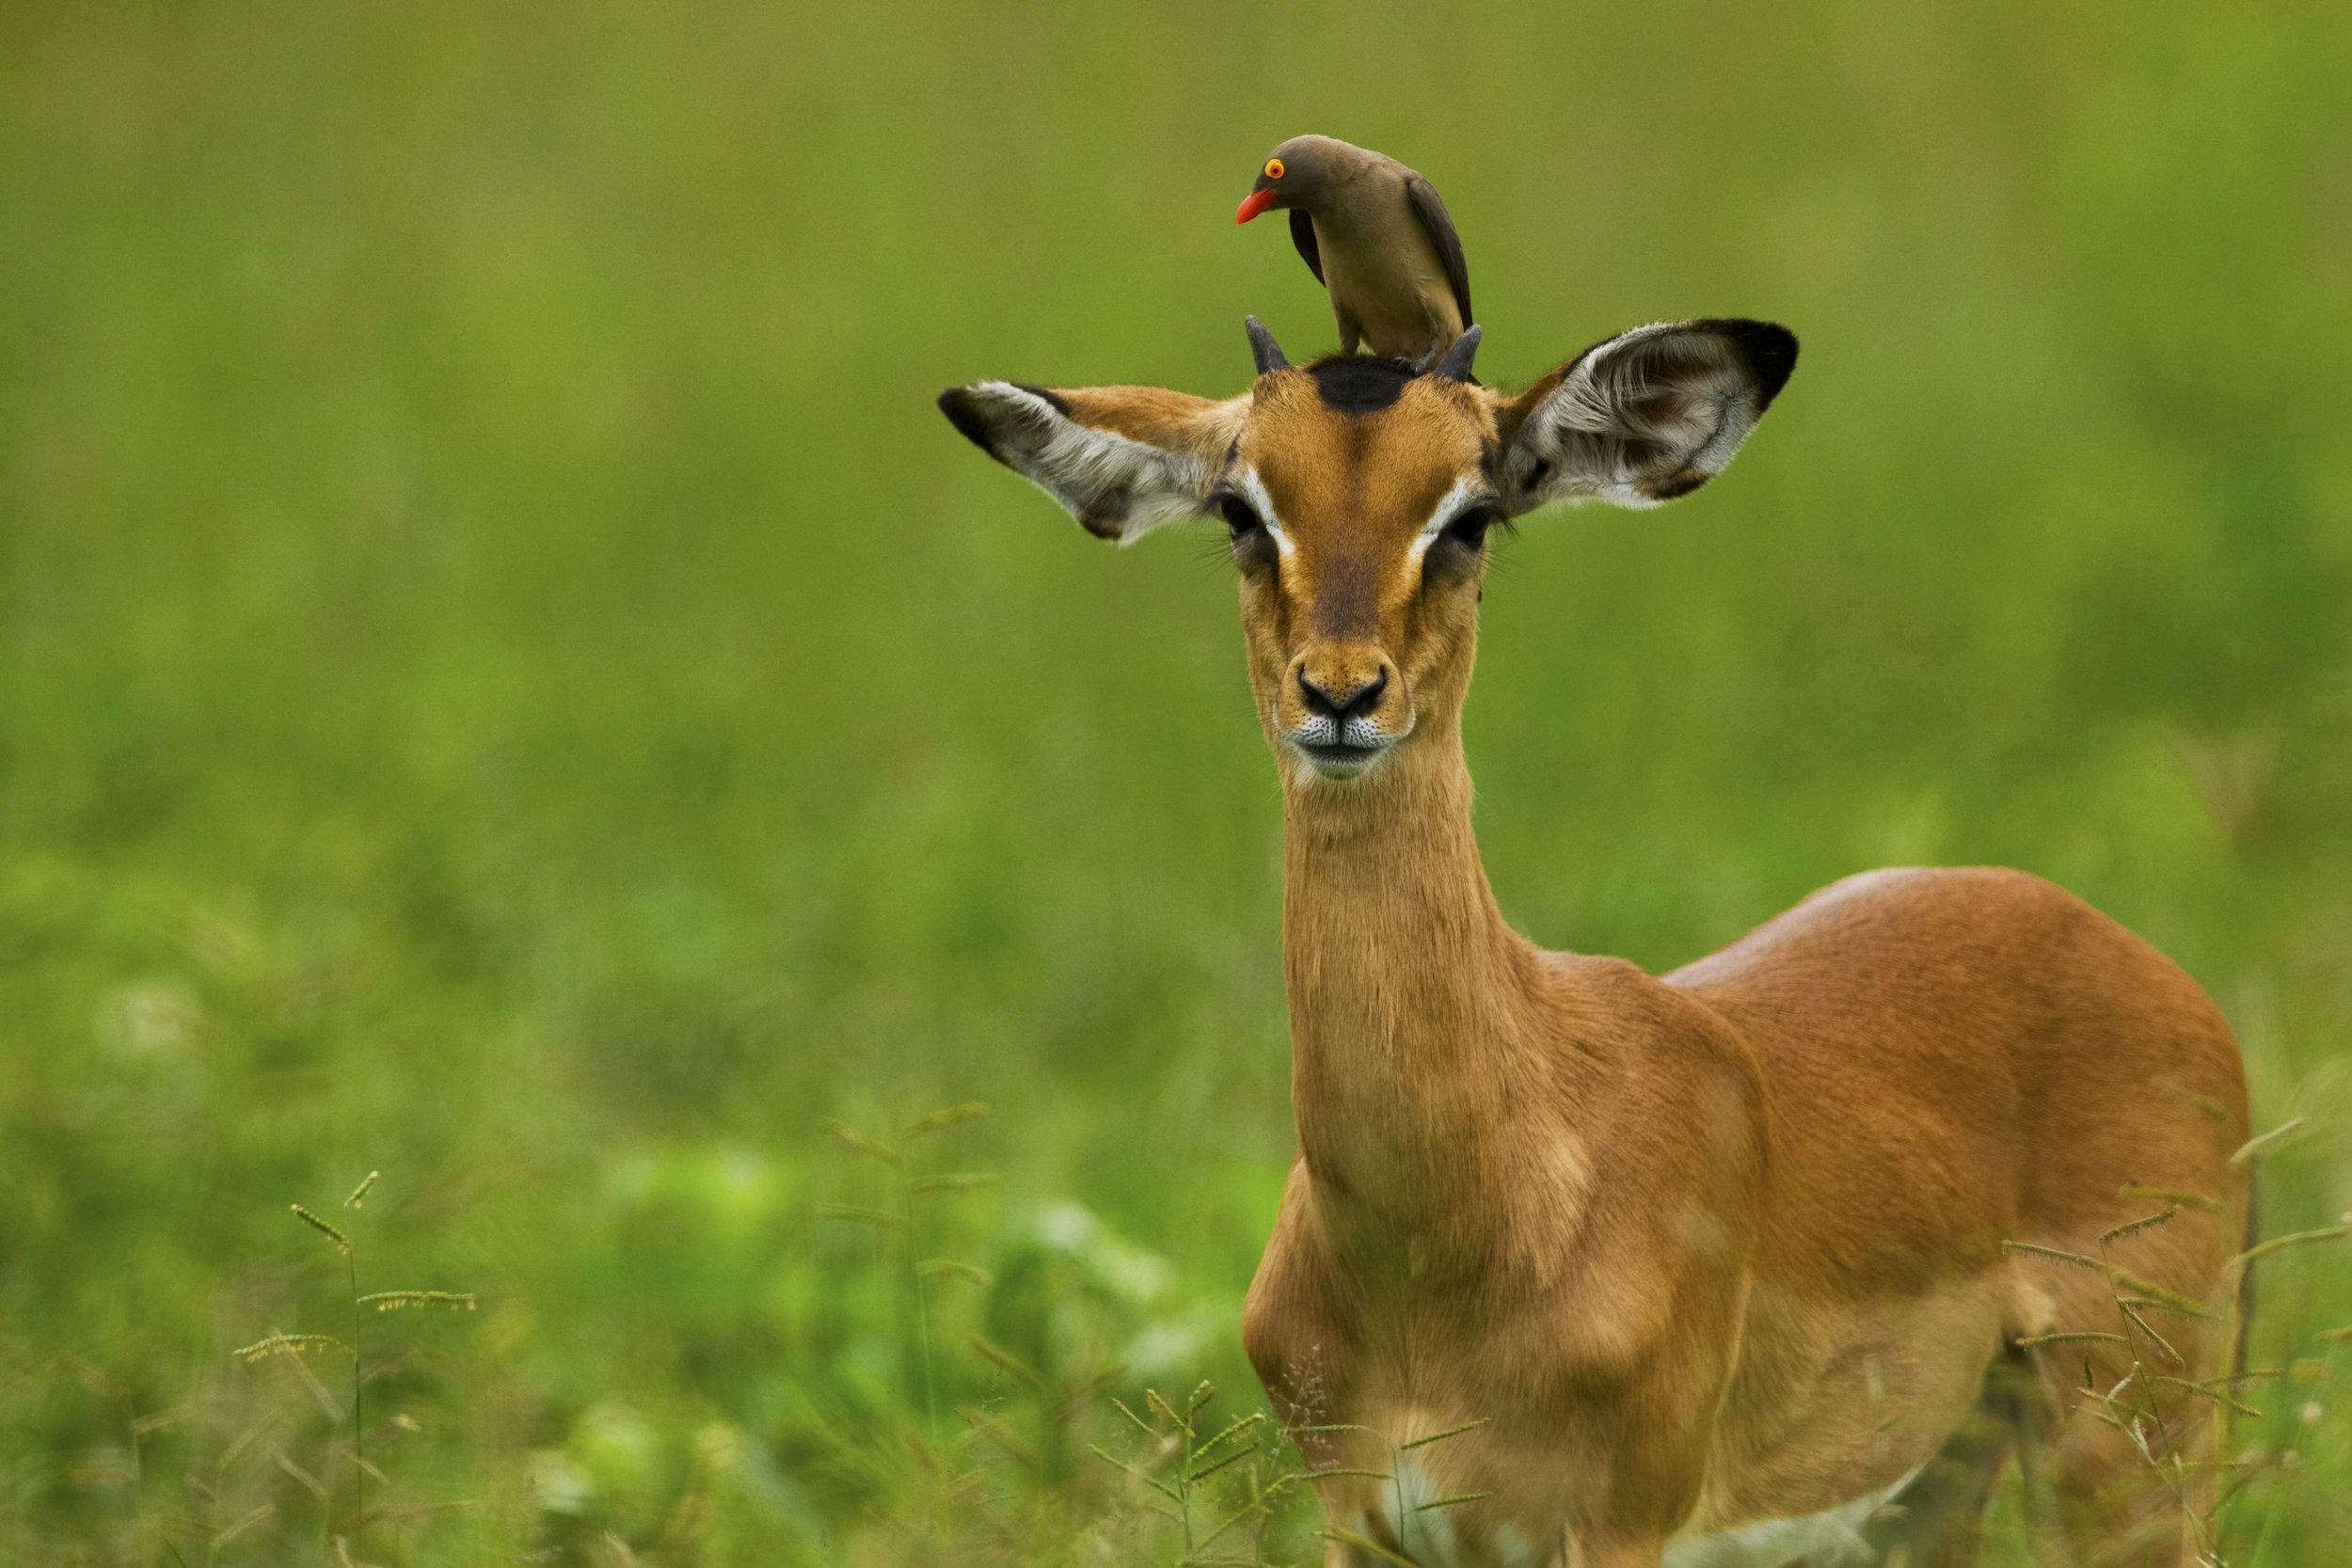 selindacamp-wildlife-greatplainsconservation-46.jpg